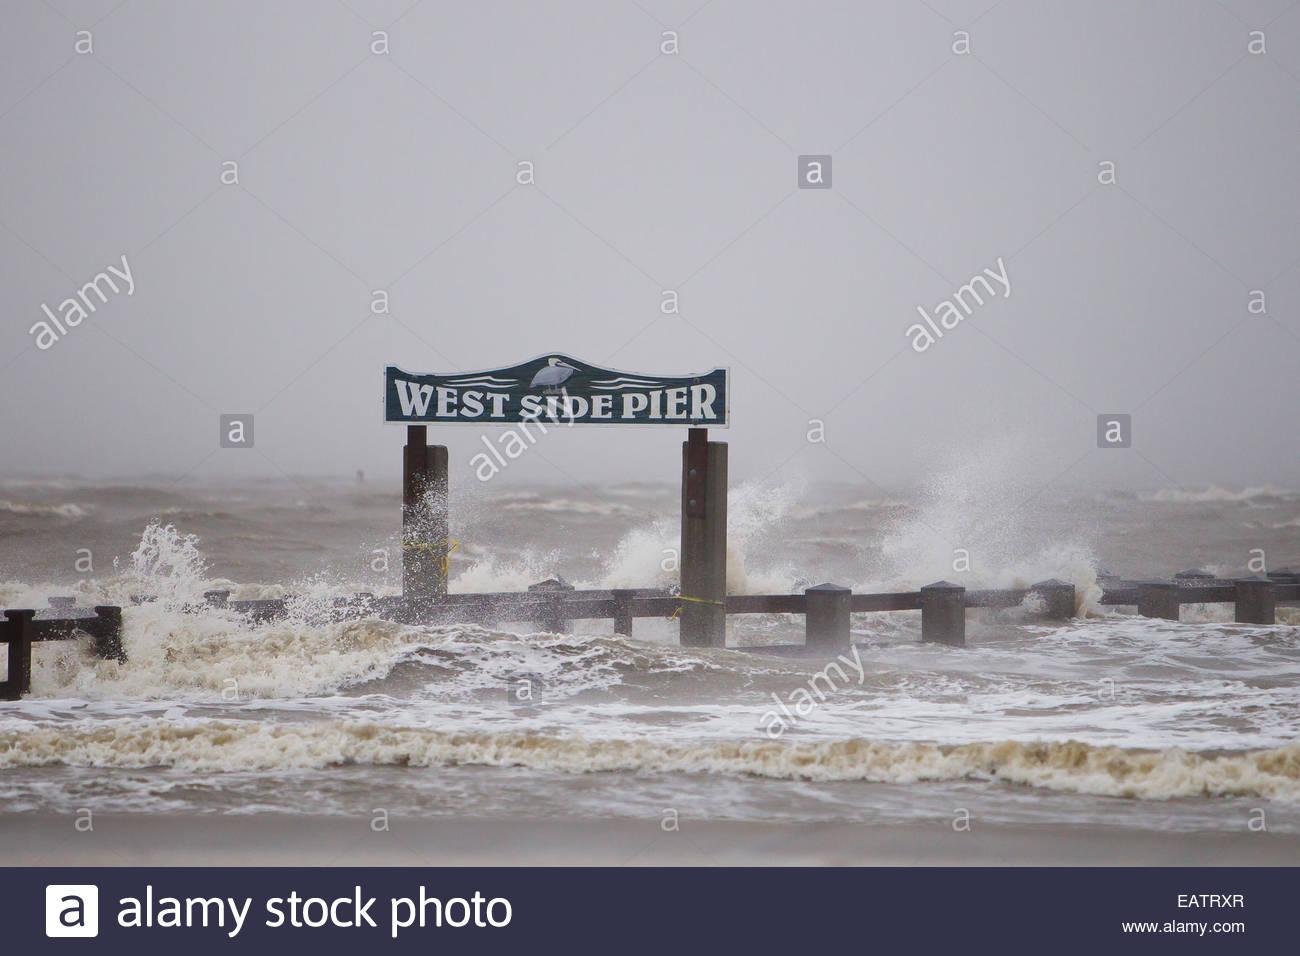 Hurricane Isaac Sturm Welle Wellen in der West Side-Pier. Stockbild